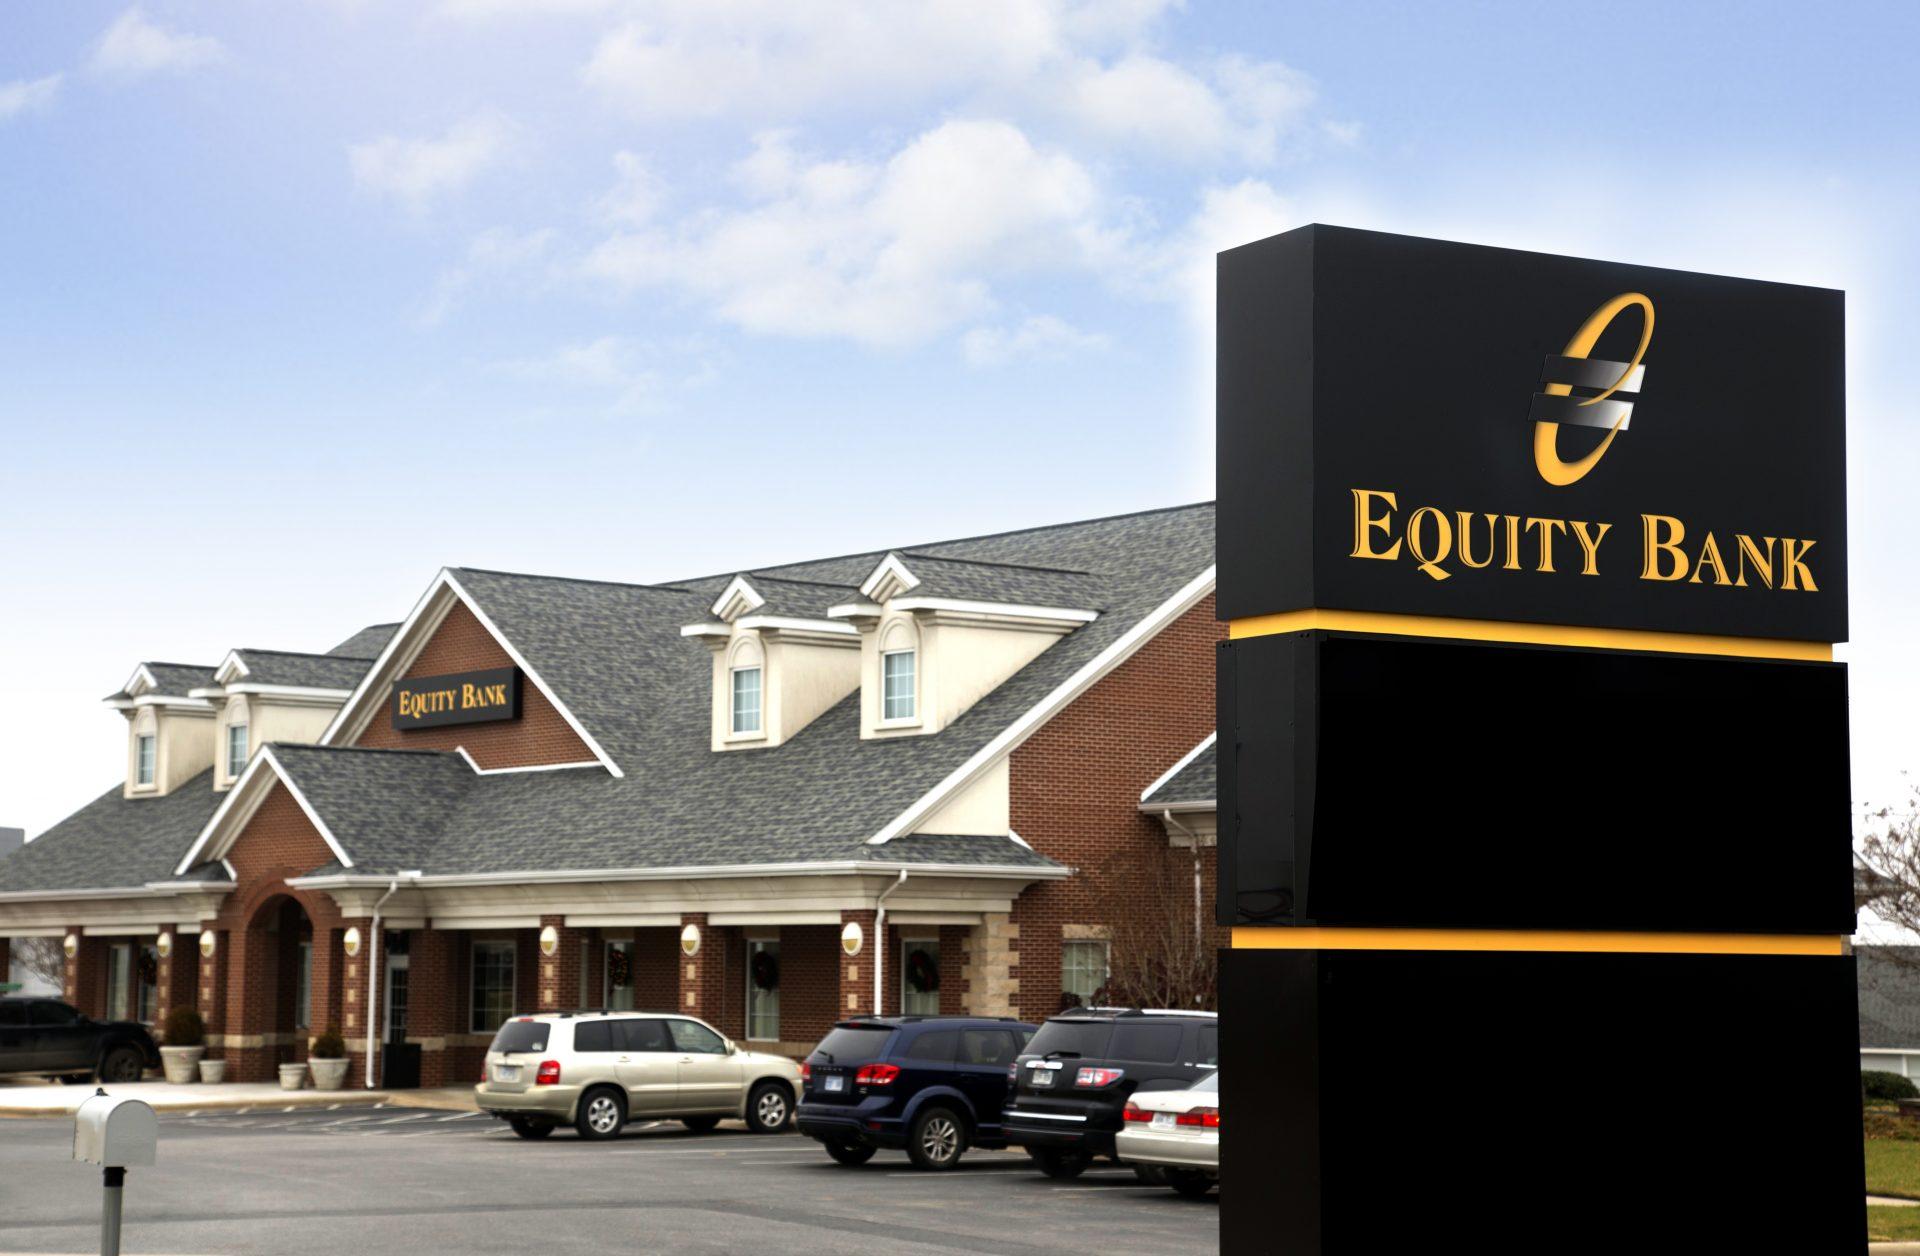 Equity Bank Berryville branch exterior.